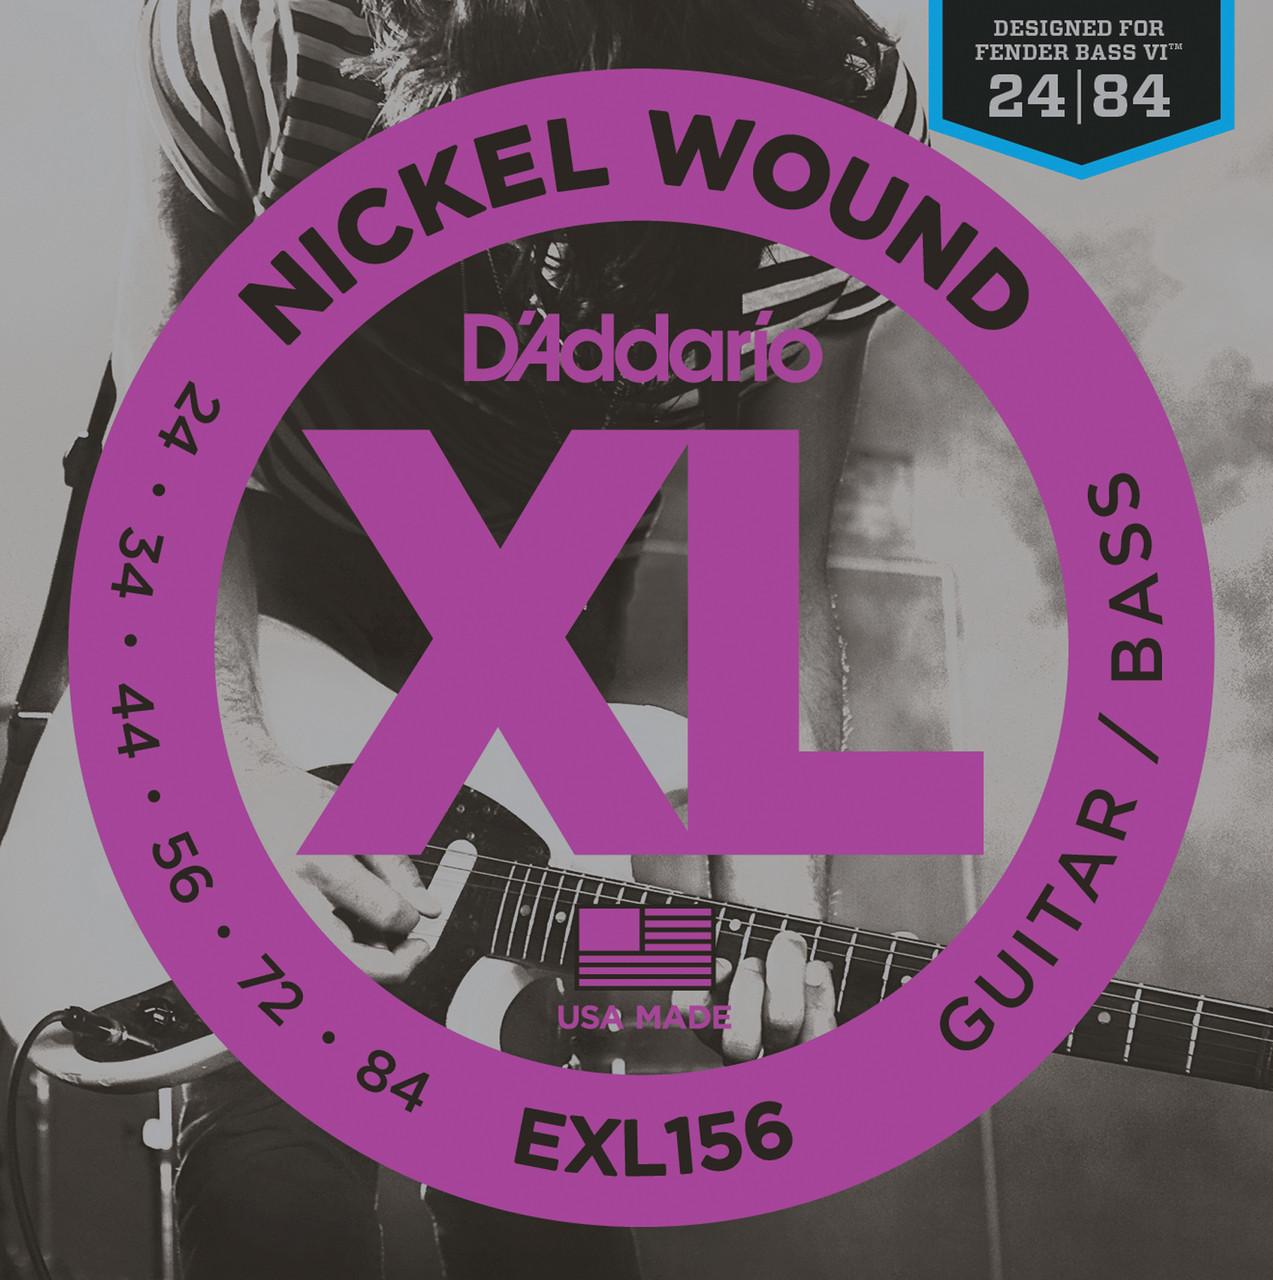 D'addario XL156 Baritone Electric Guitar Strings